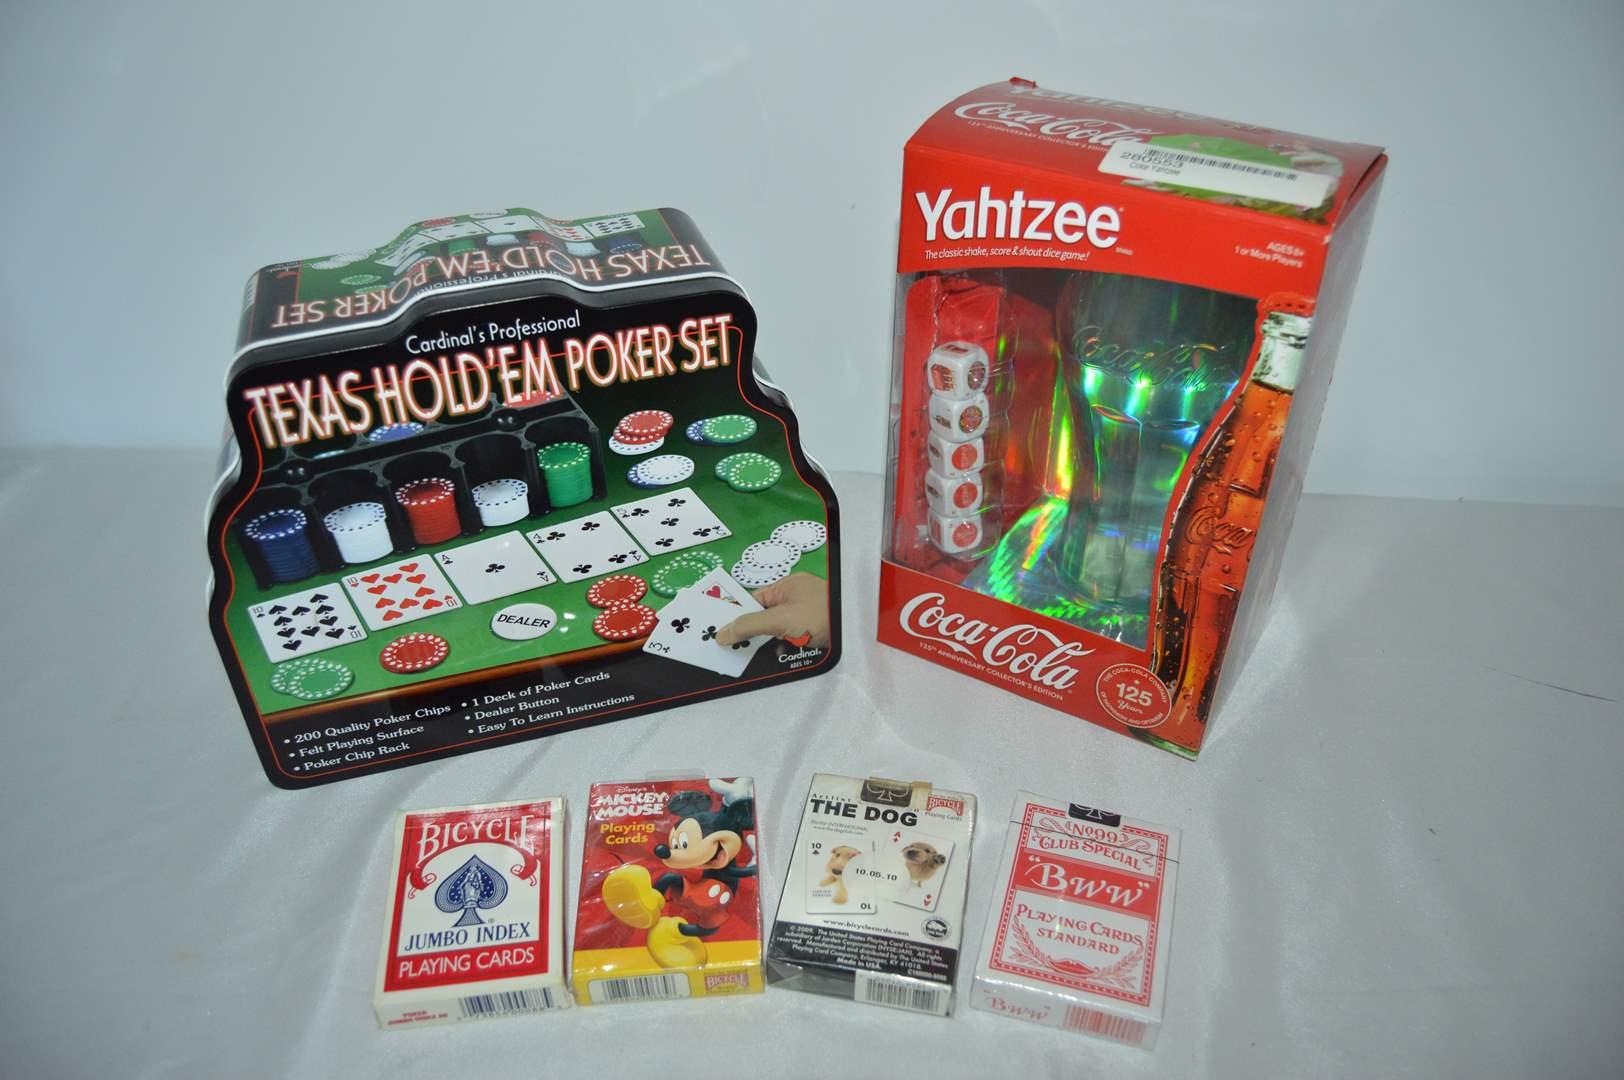 Lot # 115 Texas hold'em poker set, Coca Cola Yahtzee and 4 decks of cards (main image)